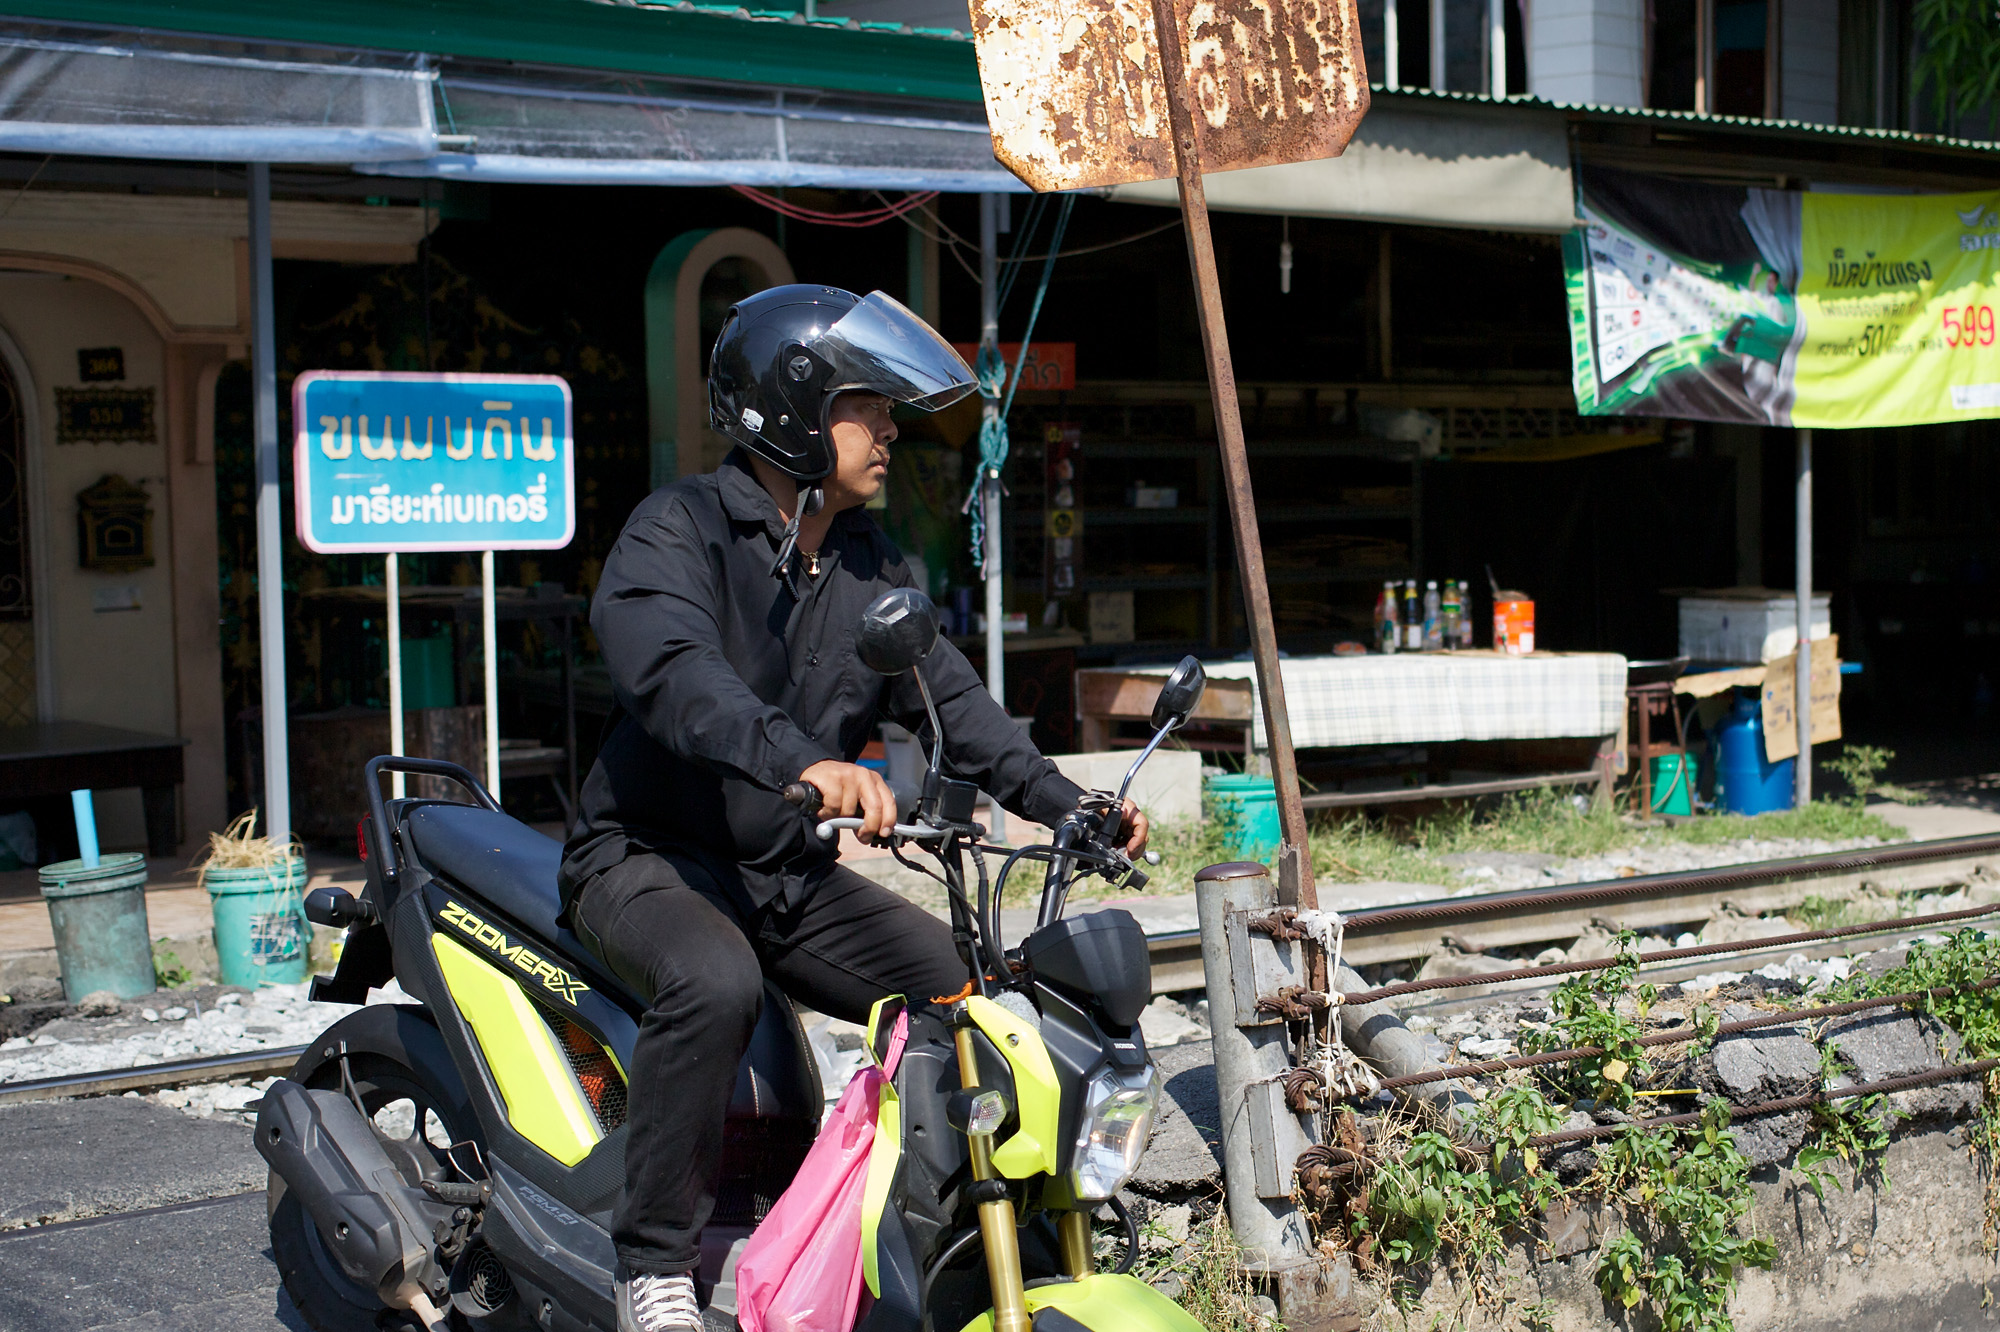 scooter crossing rail at Wongwian Yai